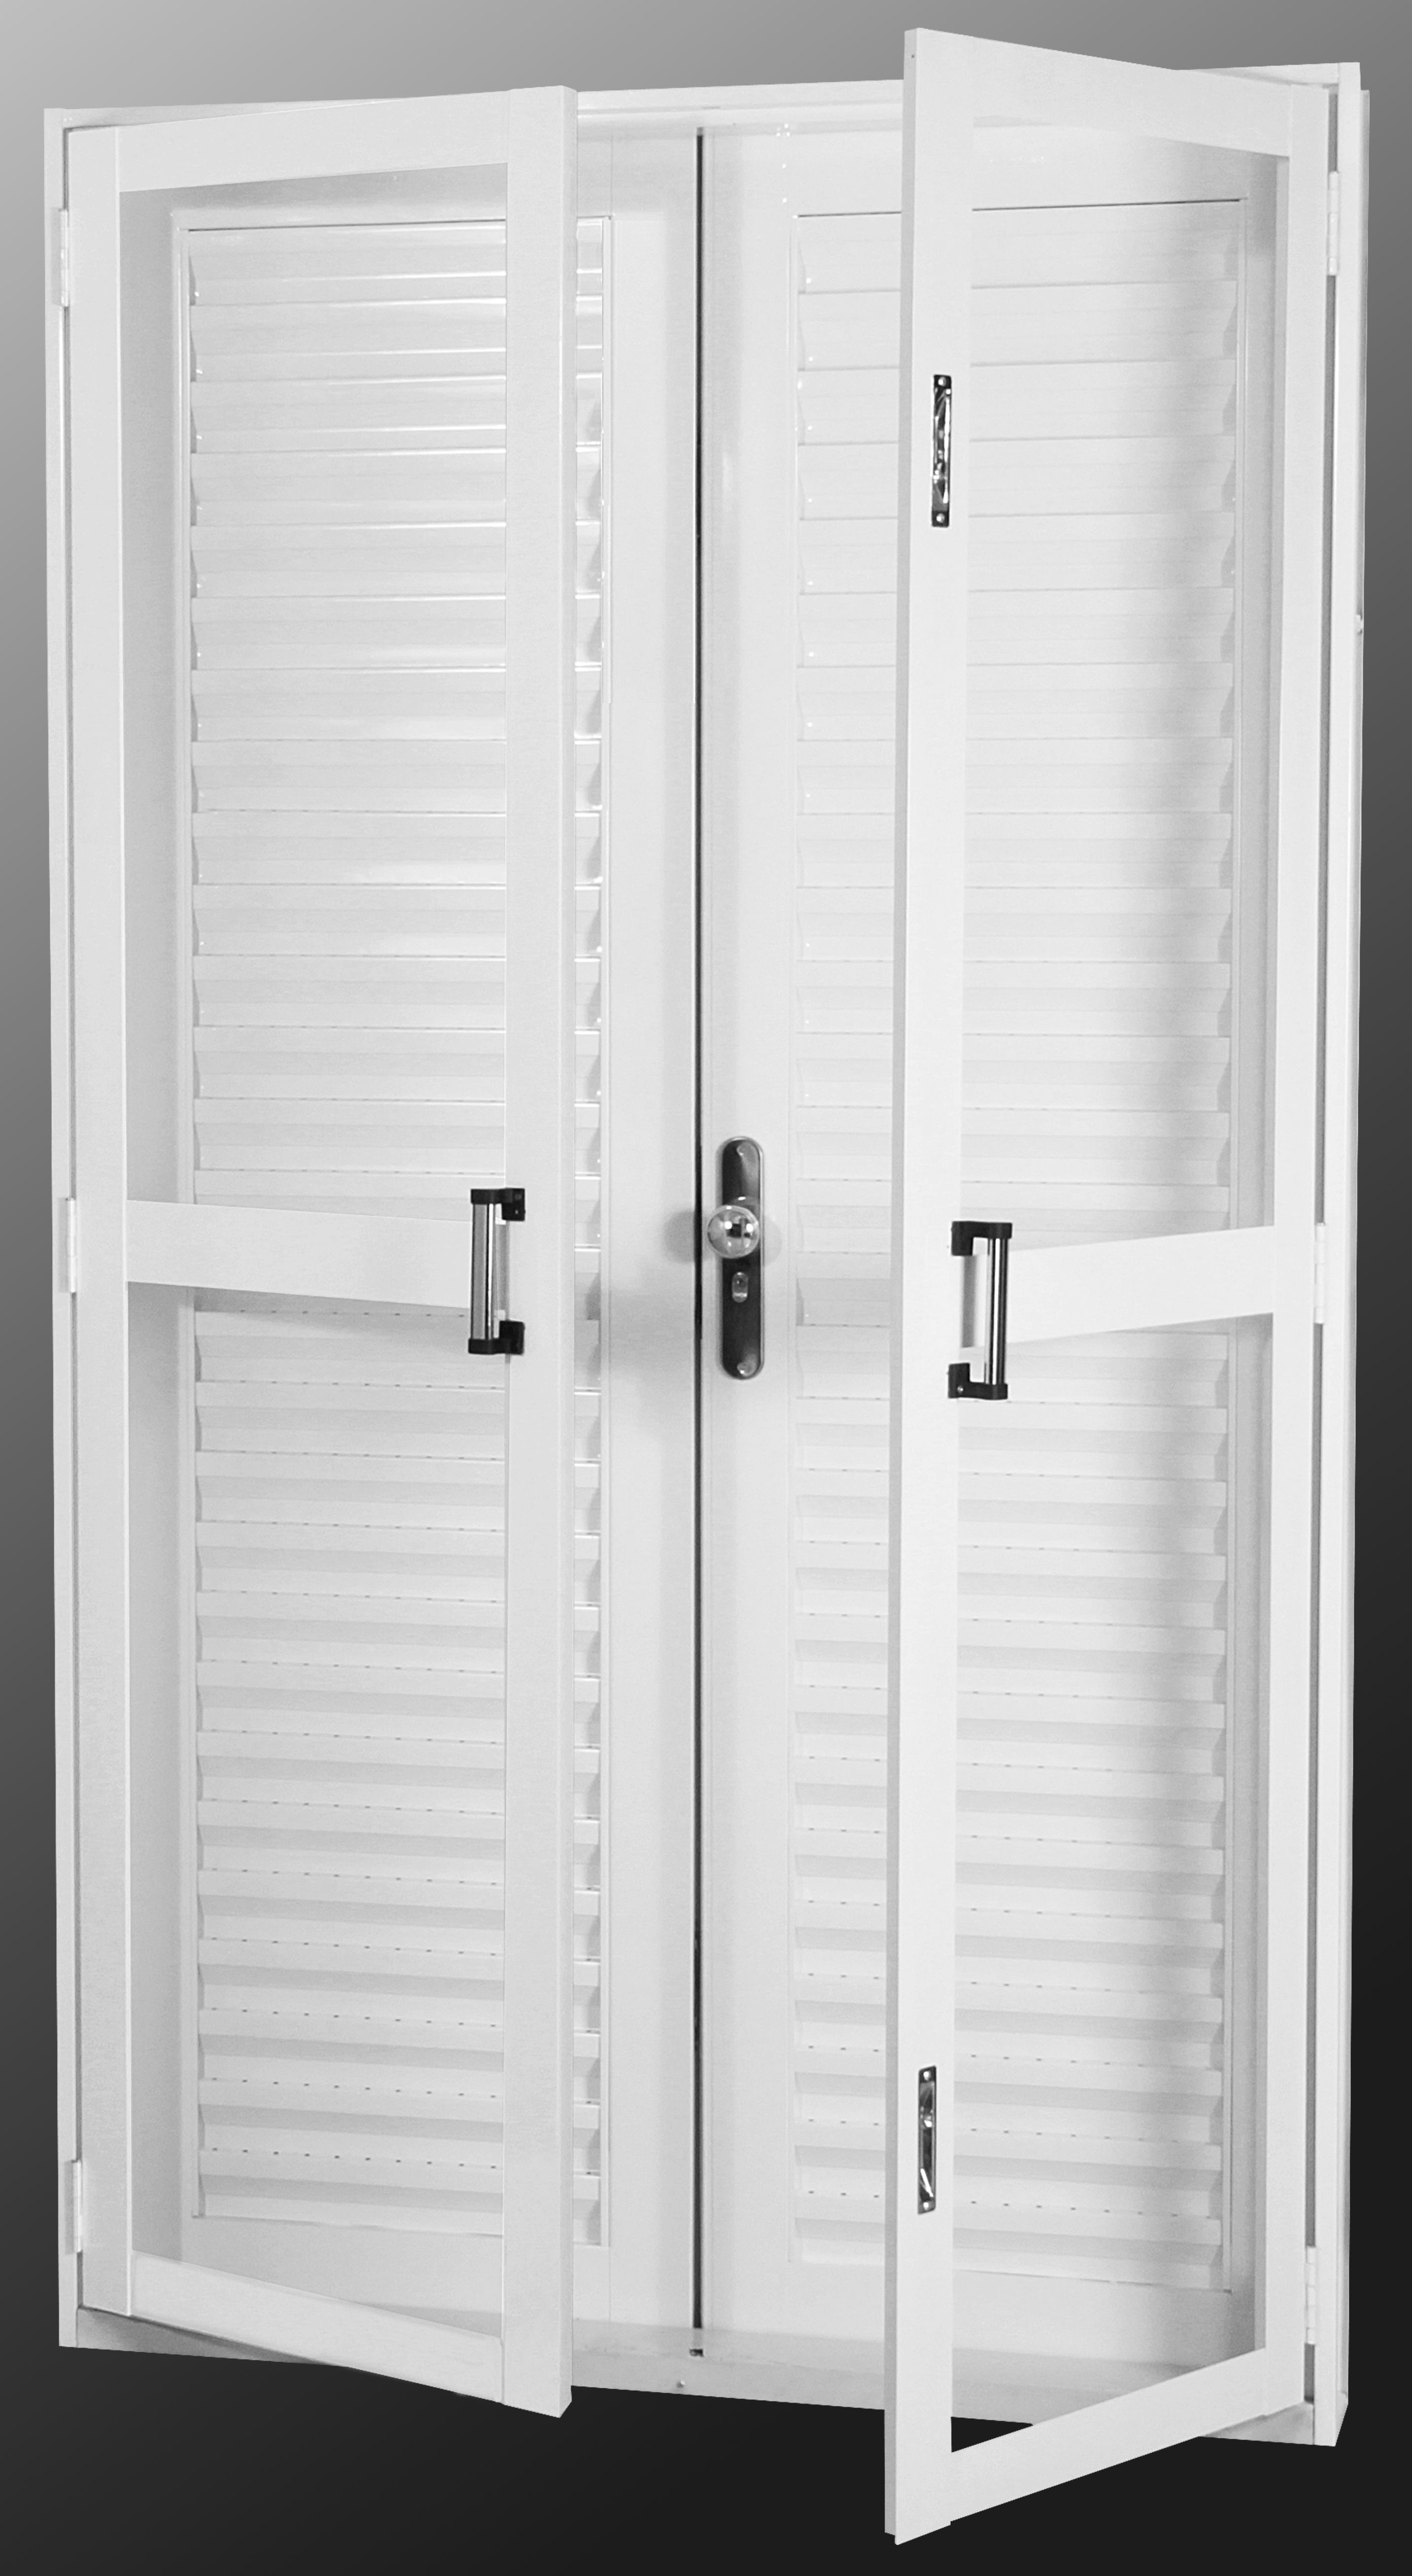 #666666 Porta Porta Balcao Janela Veneziana Vitro Em Aluminio Pictures to pin  1214 Portas E Janelas De Pvc Tigre